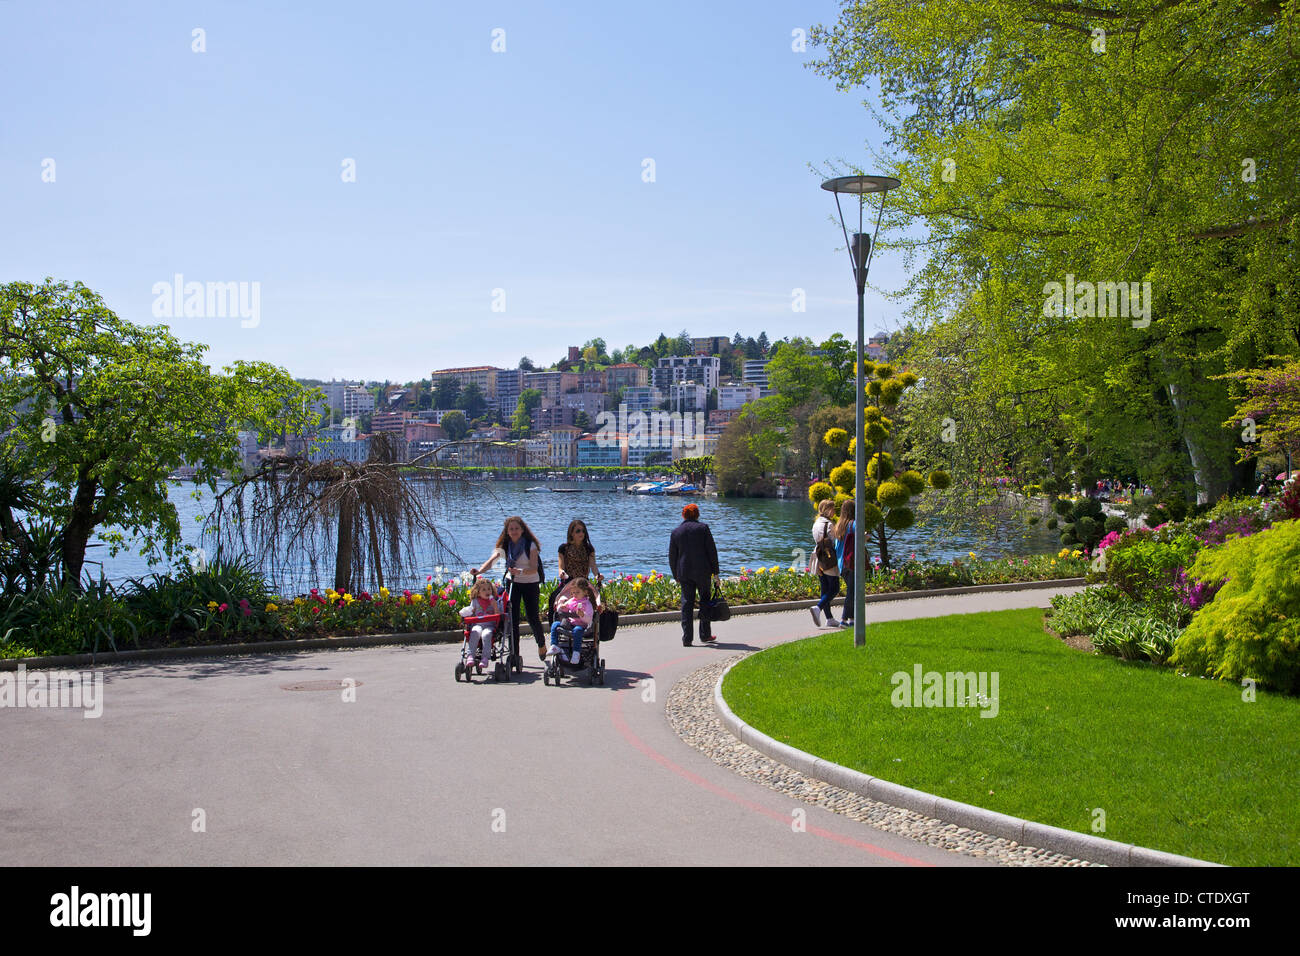 View of city of Lugano from Parco Civico, Lugano, Lake Lugano, Ticino, Switzerland, Europe - Stock Image